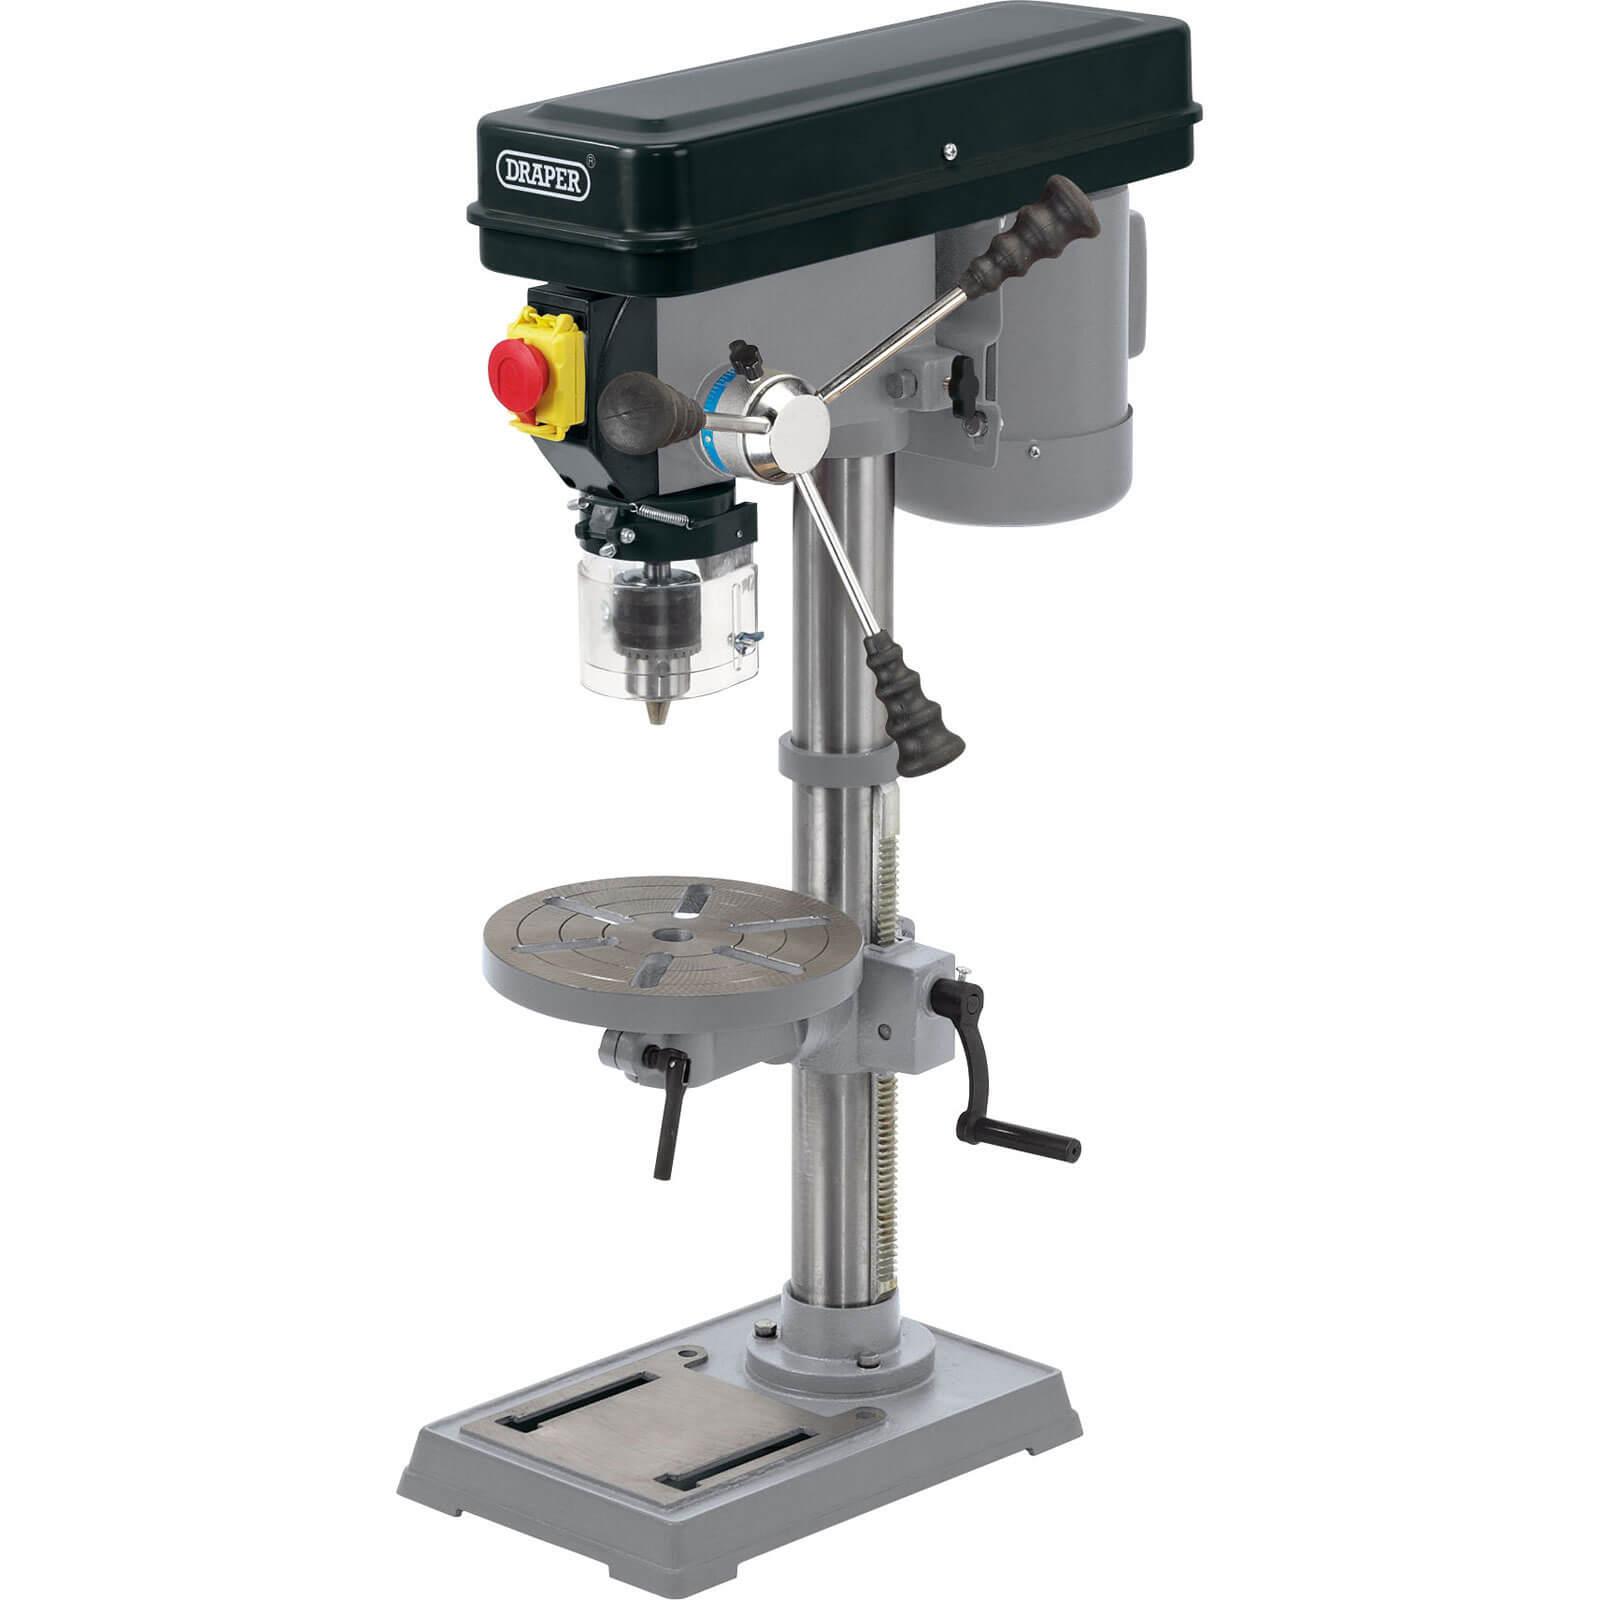 Draper 94802 5 Speed Bench Drill 375W